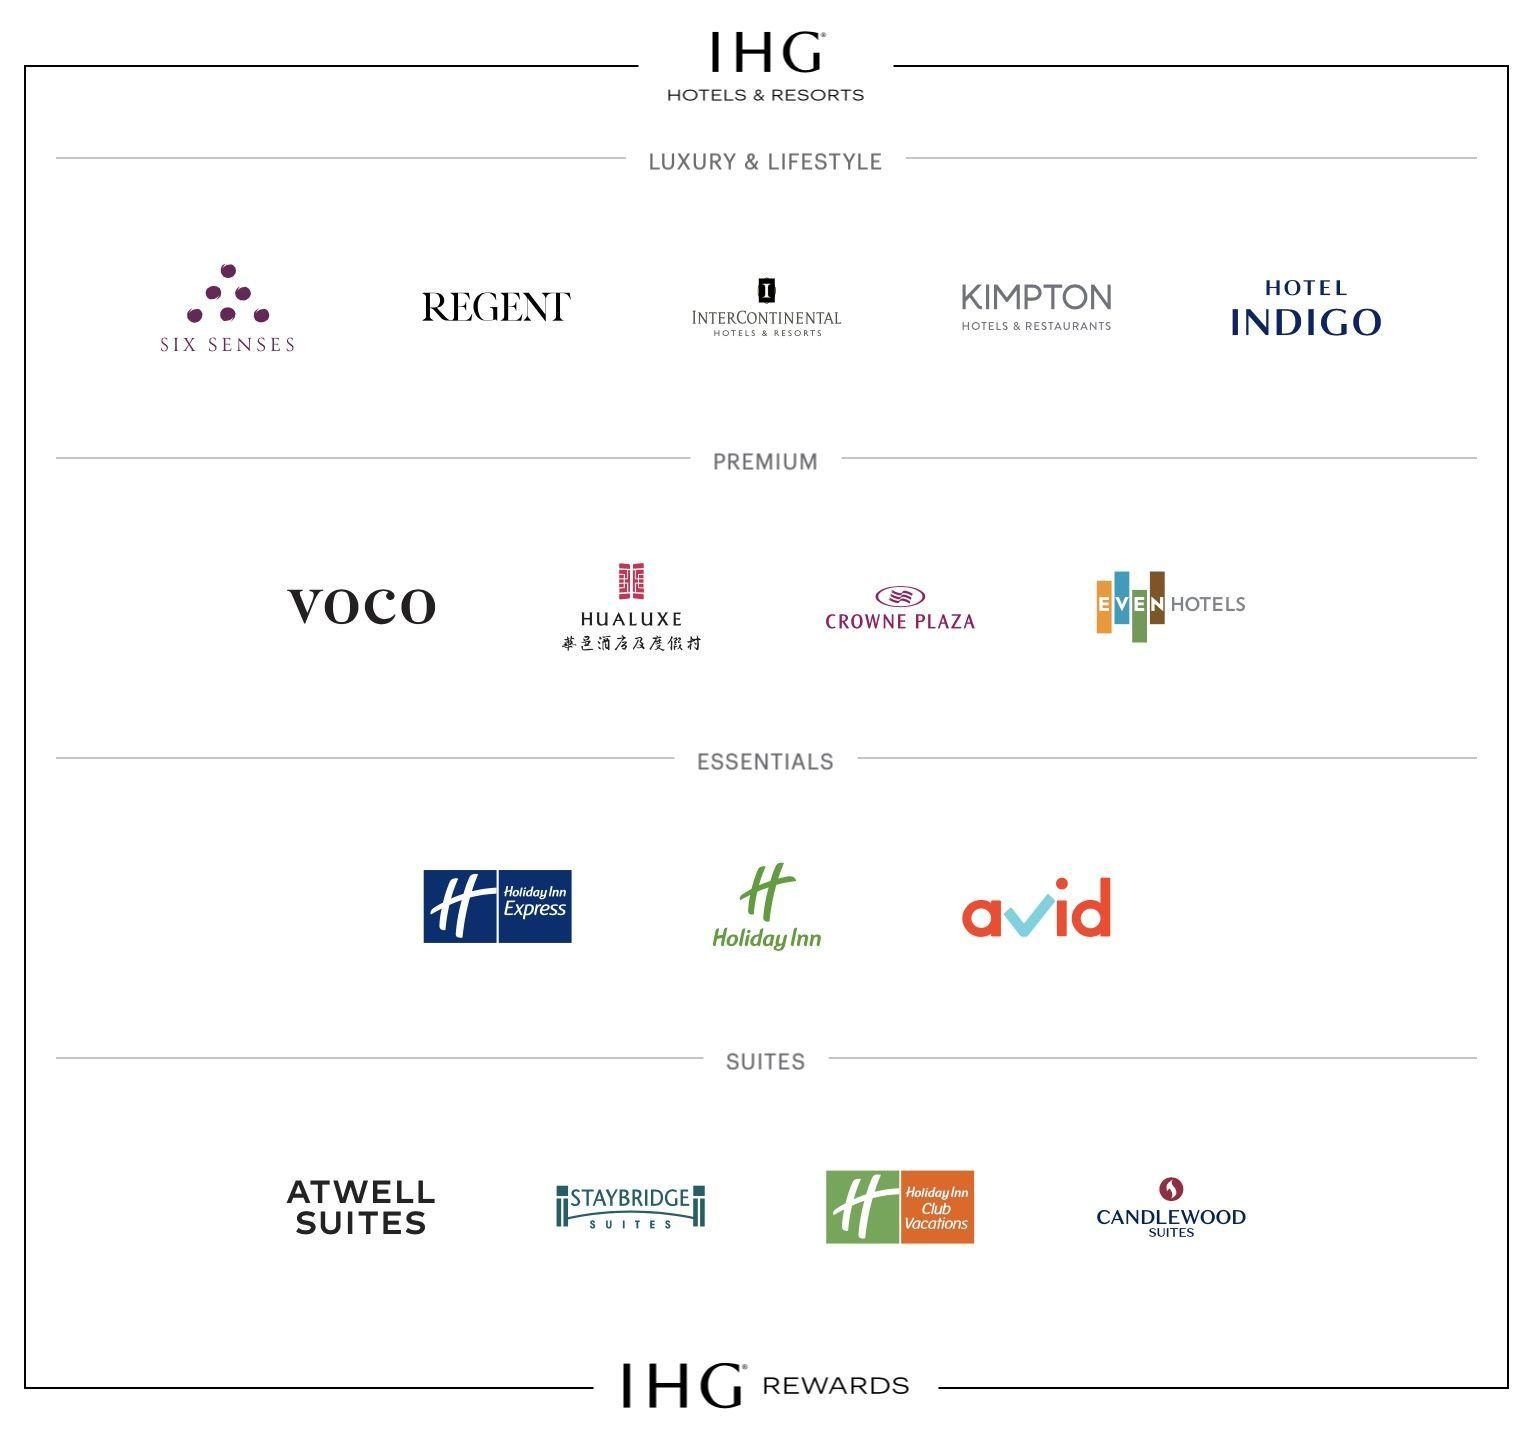 IHG Hotels Resorts marca